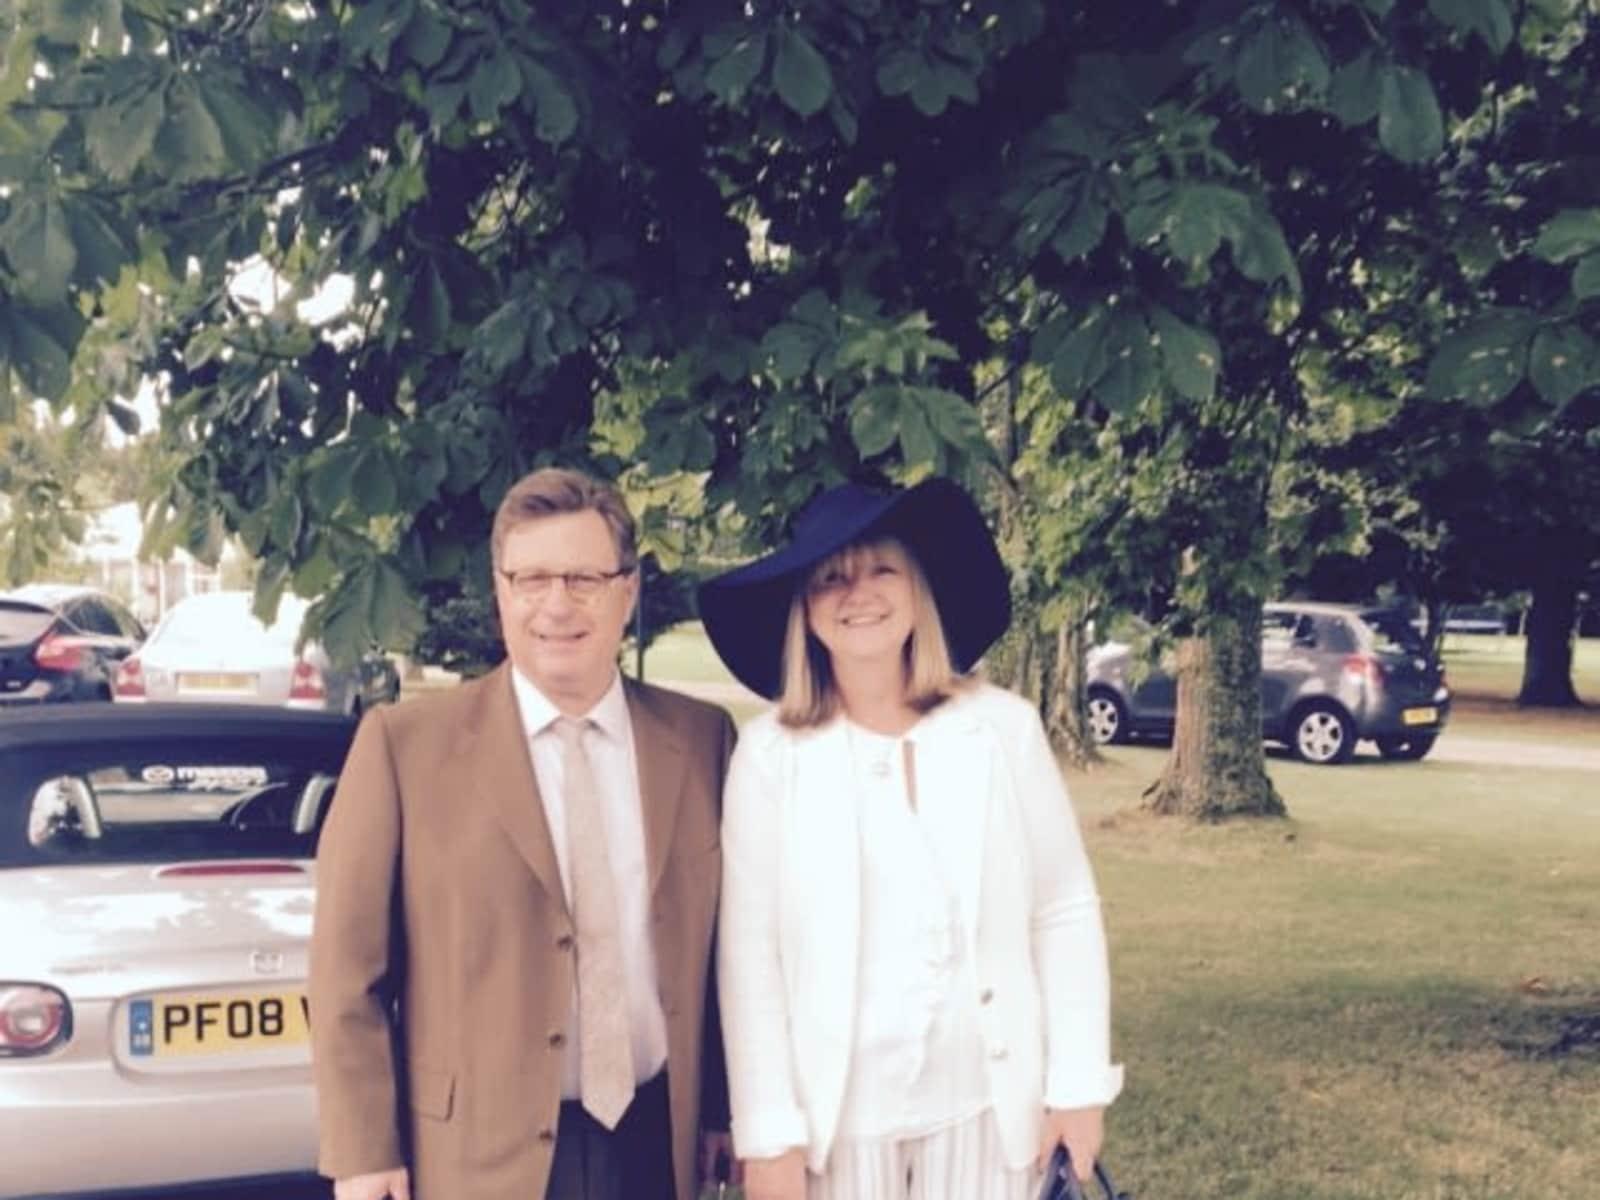 Lesley & Stewart from London, United Kingdom